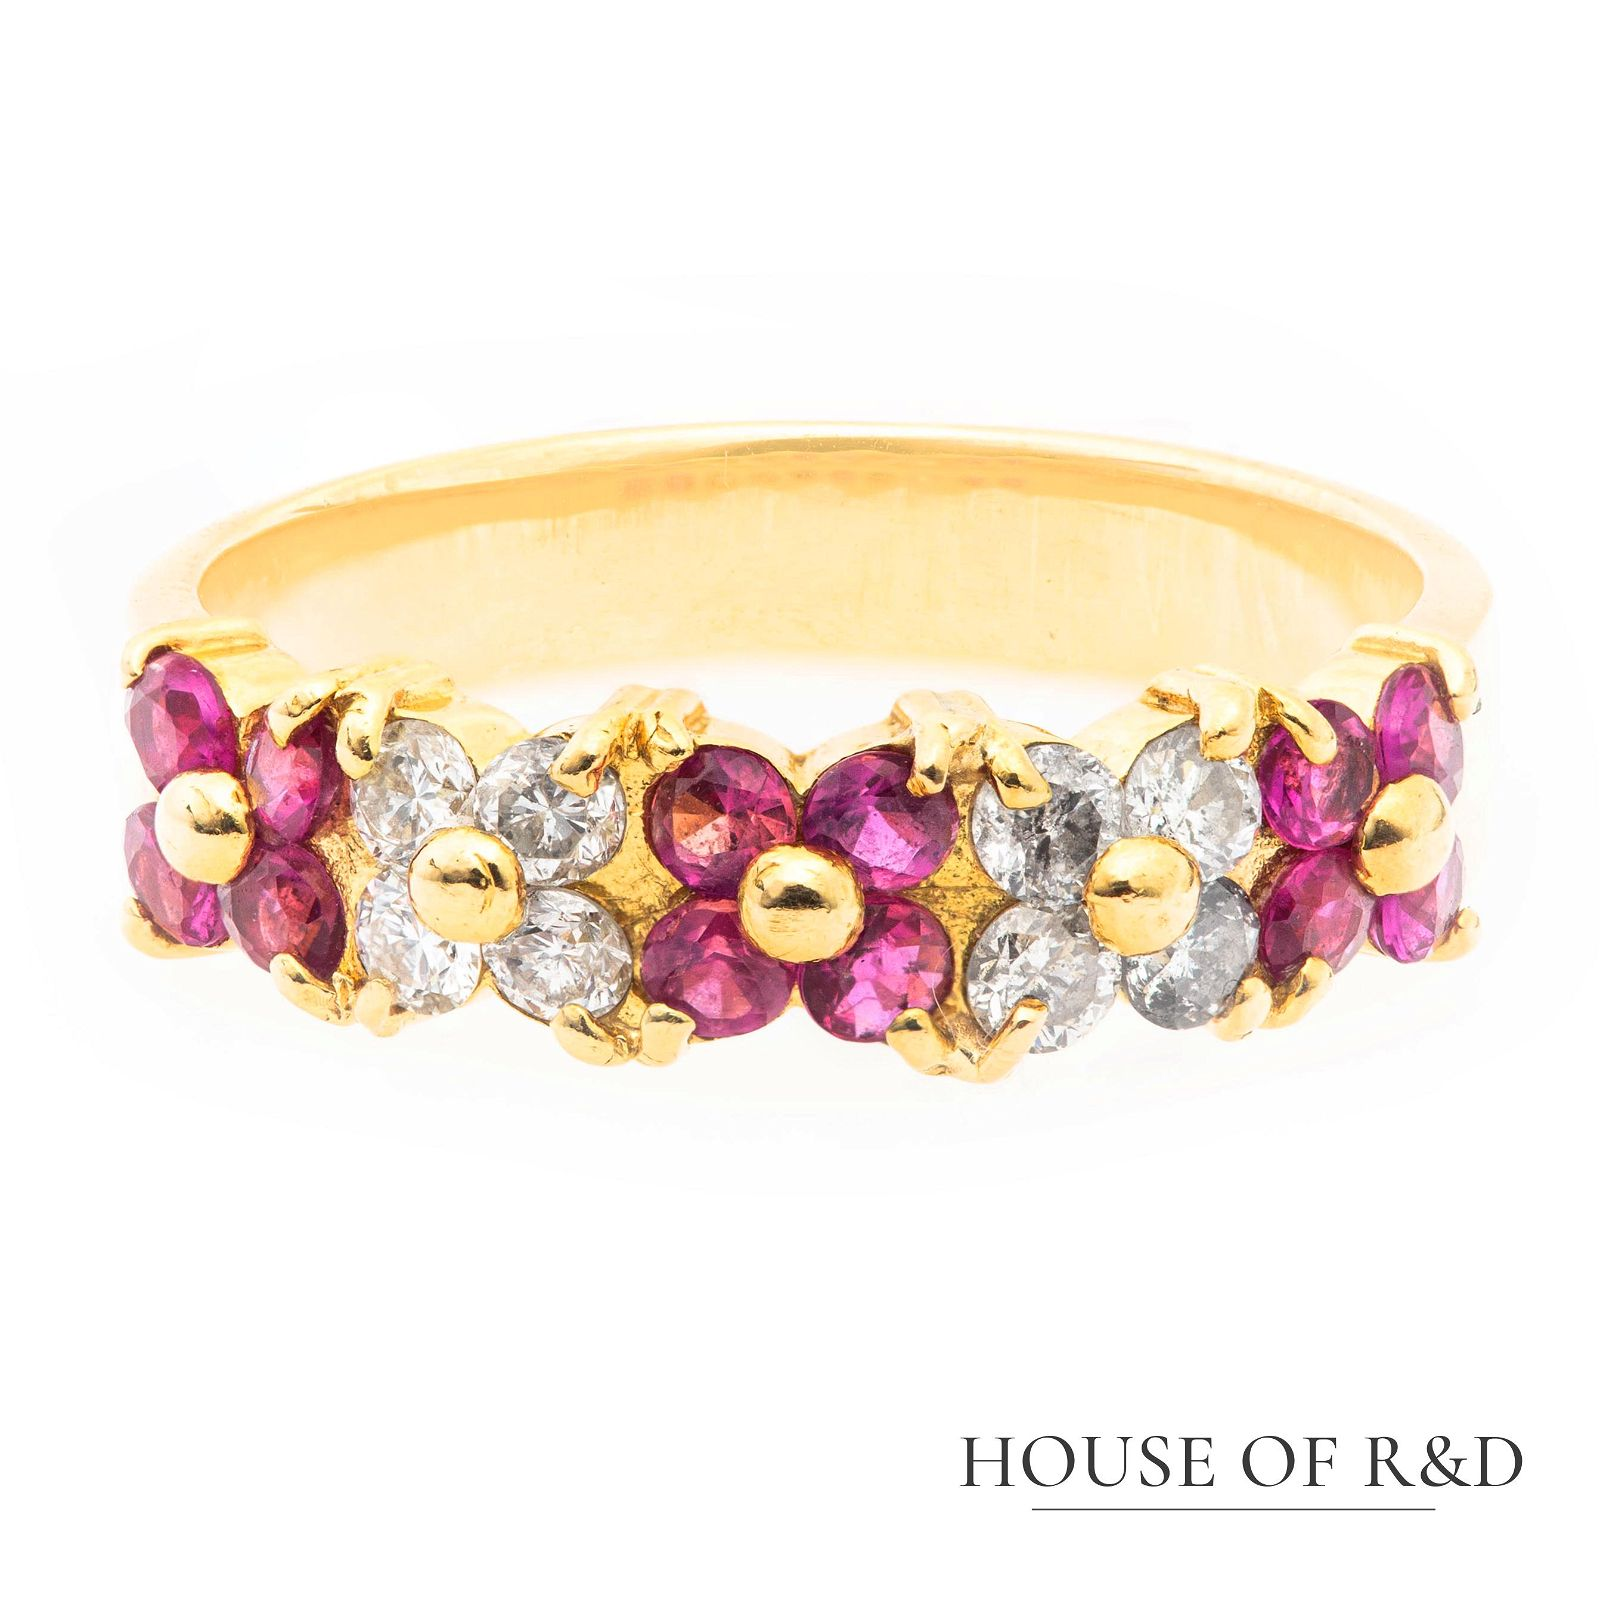 18k Yellow Gold - 0.80tcw -  Ruby & Diamonds Ring